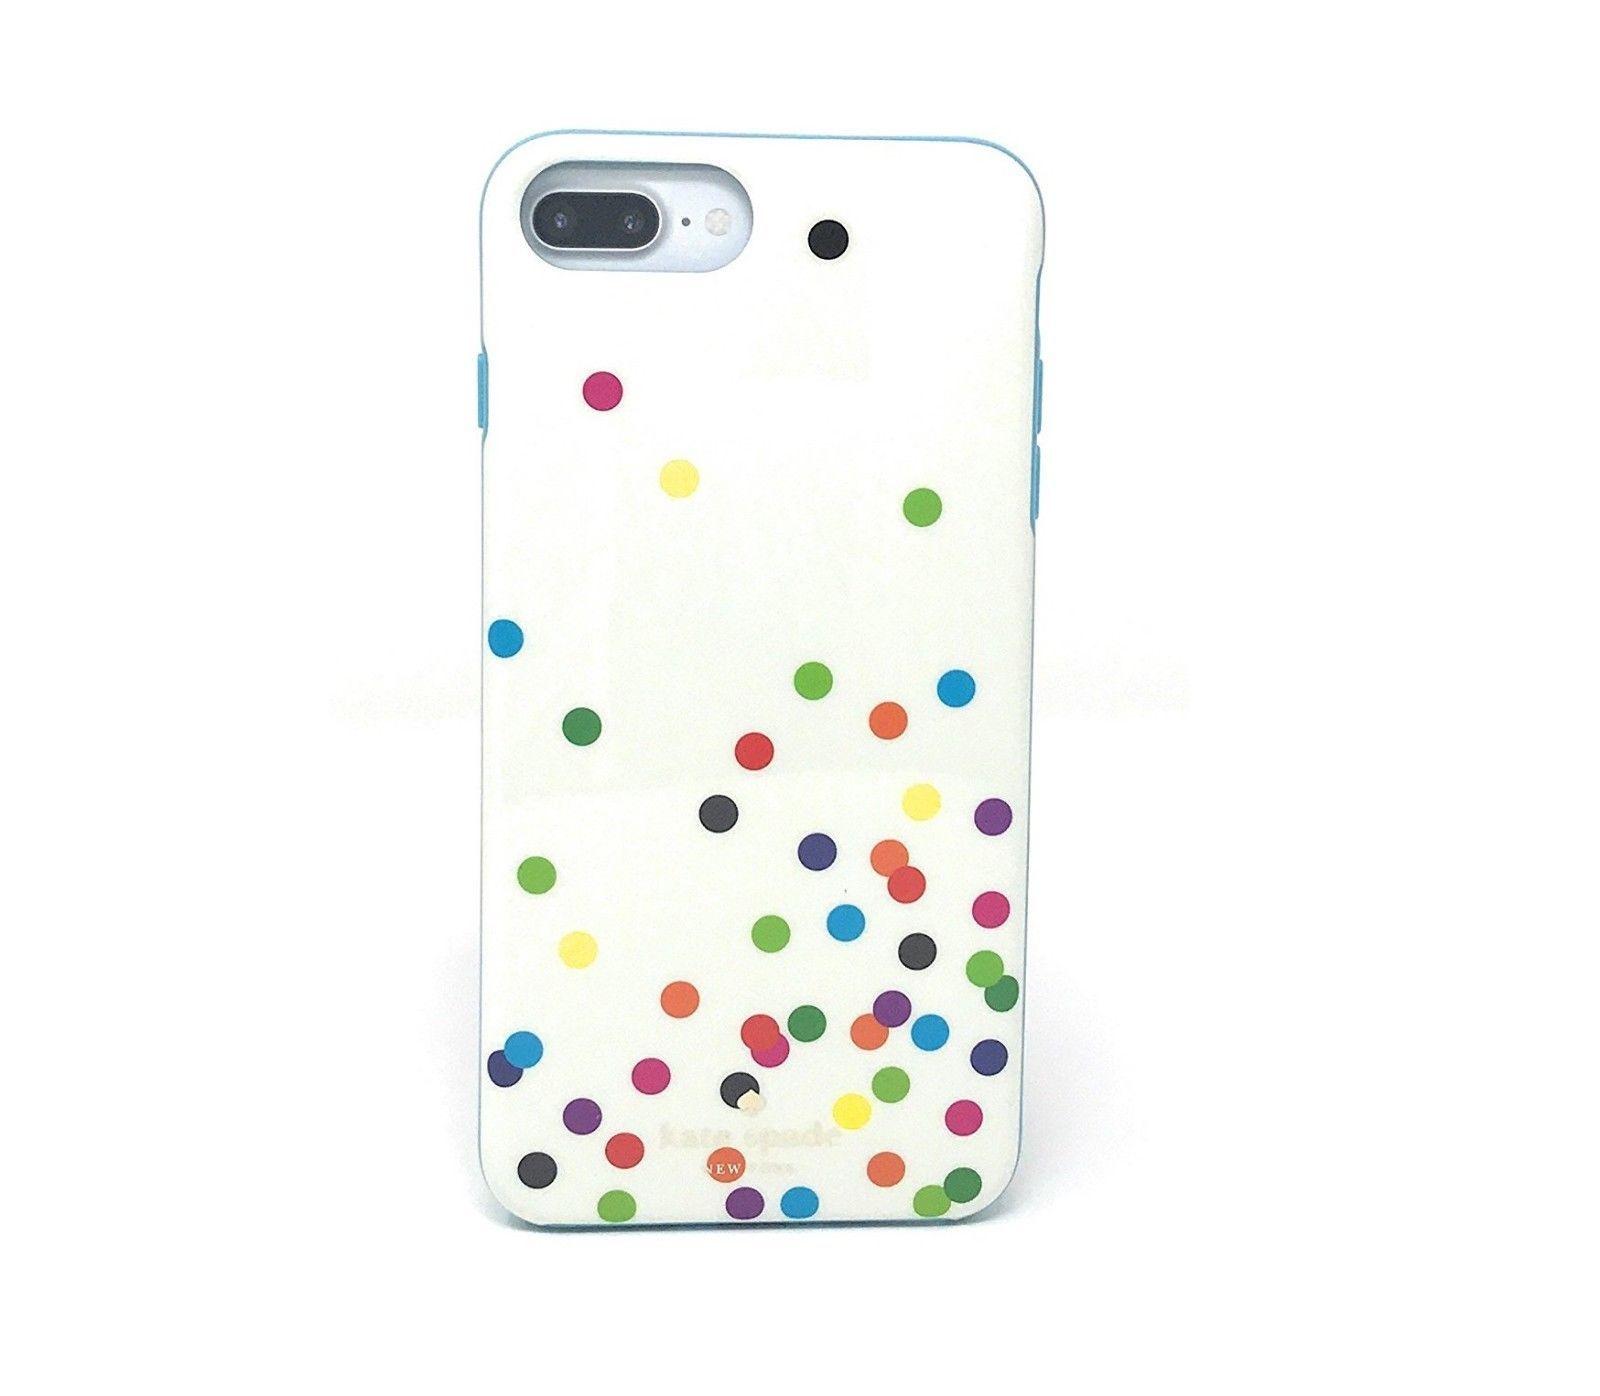 Kate Spade New York Case for iPhone 8/7 Plus/6s PLUS - Confetti Dots Multi-Color